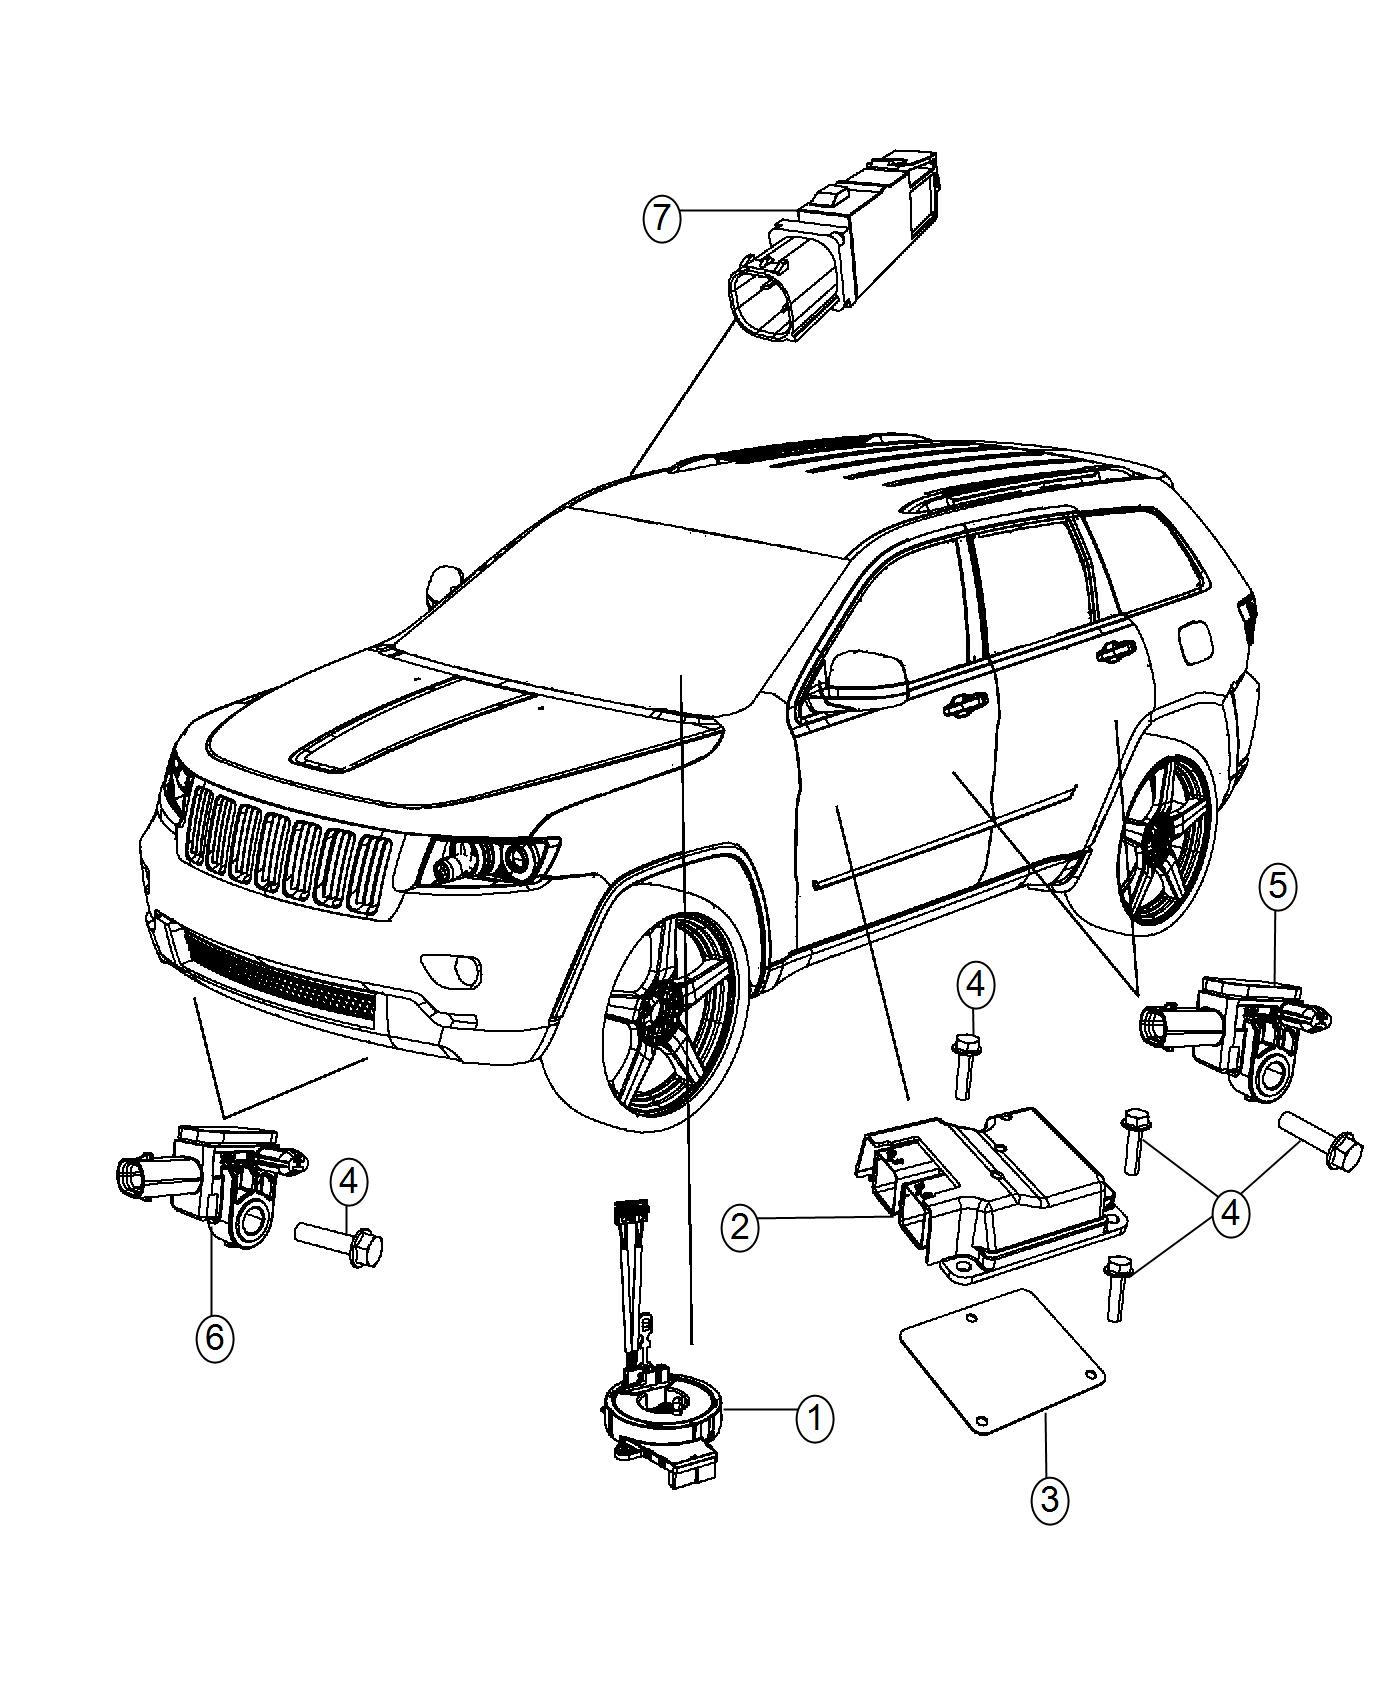 Jeep Grand Cherokee Module  Occupant Restraint  Modules